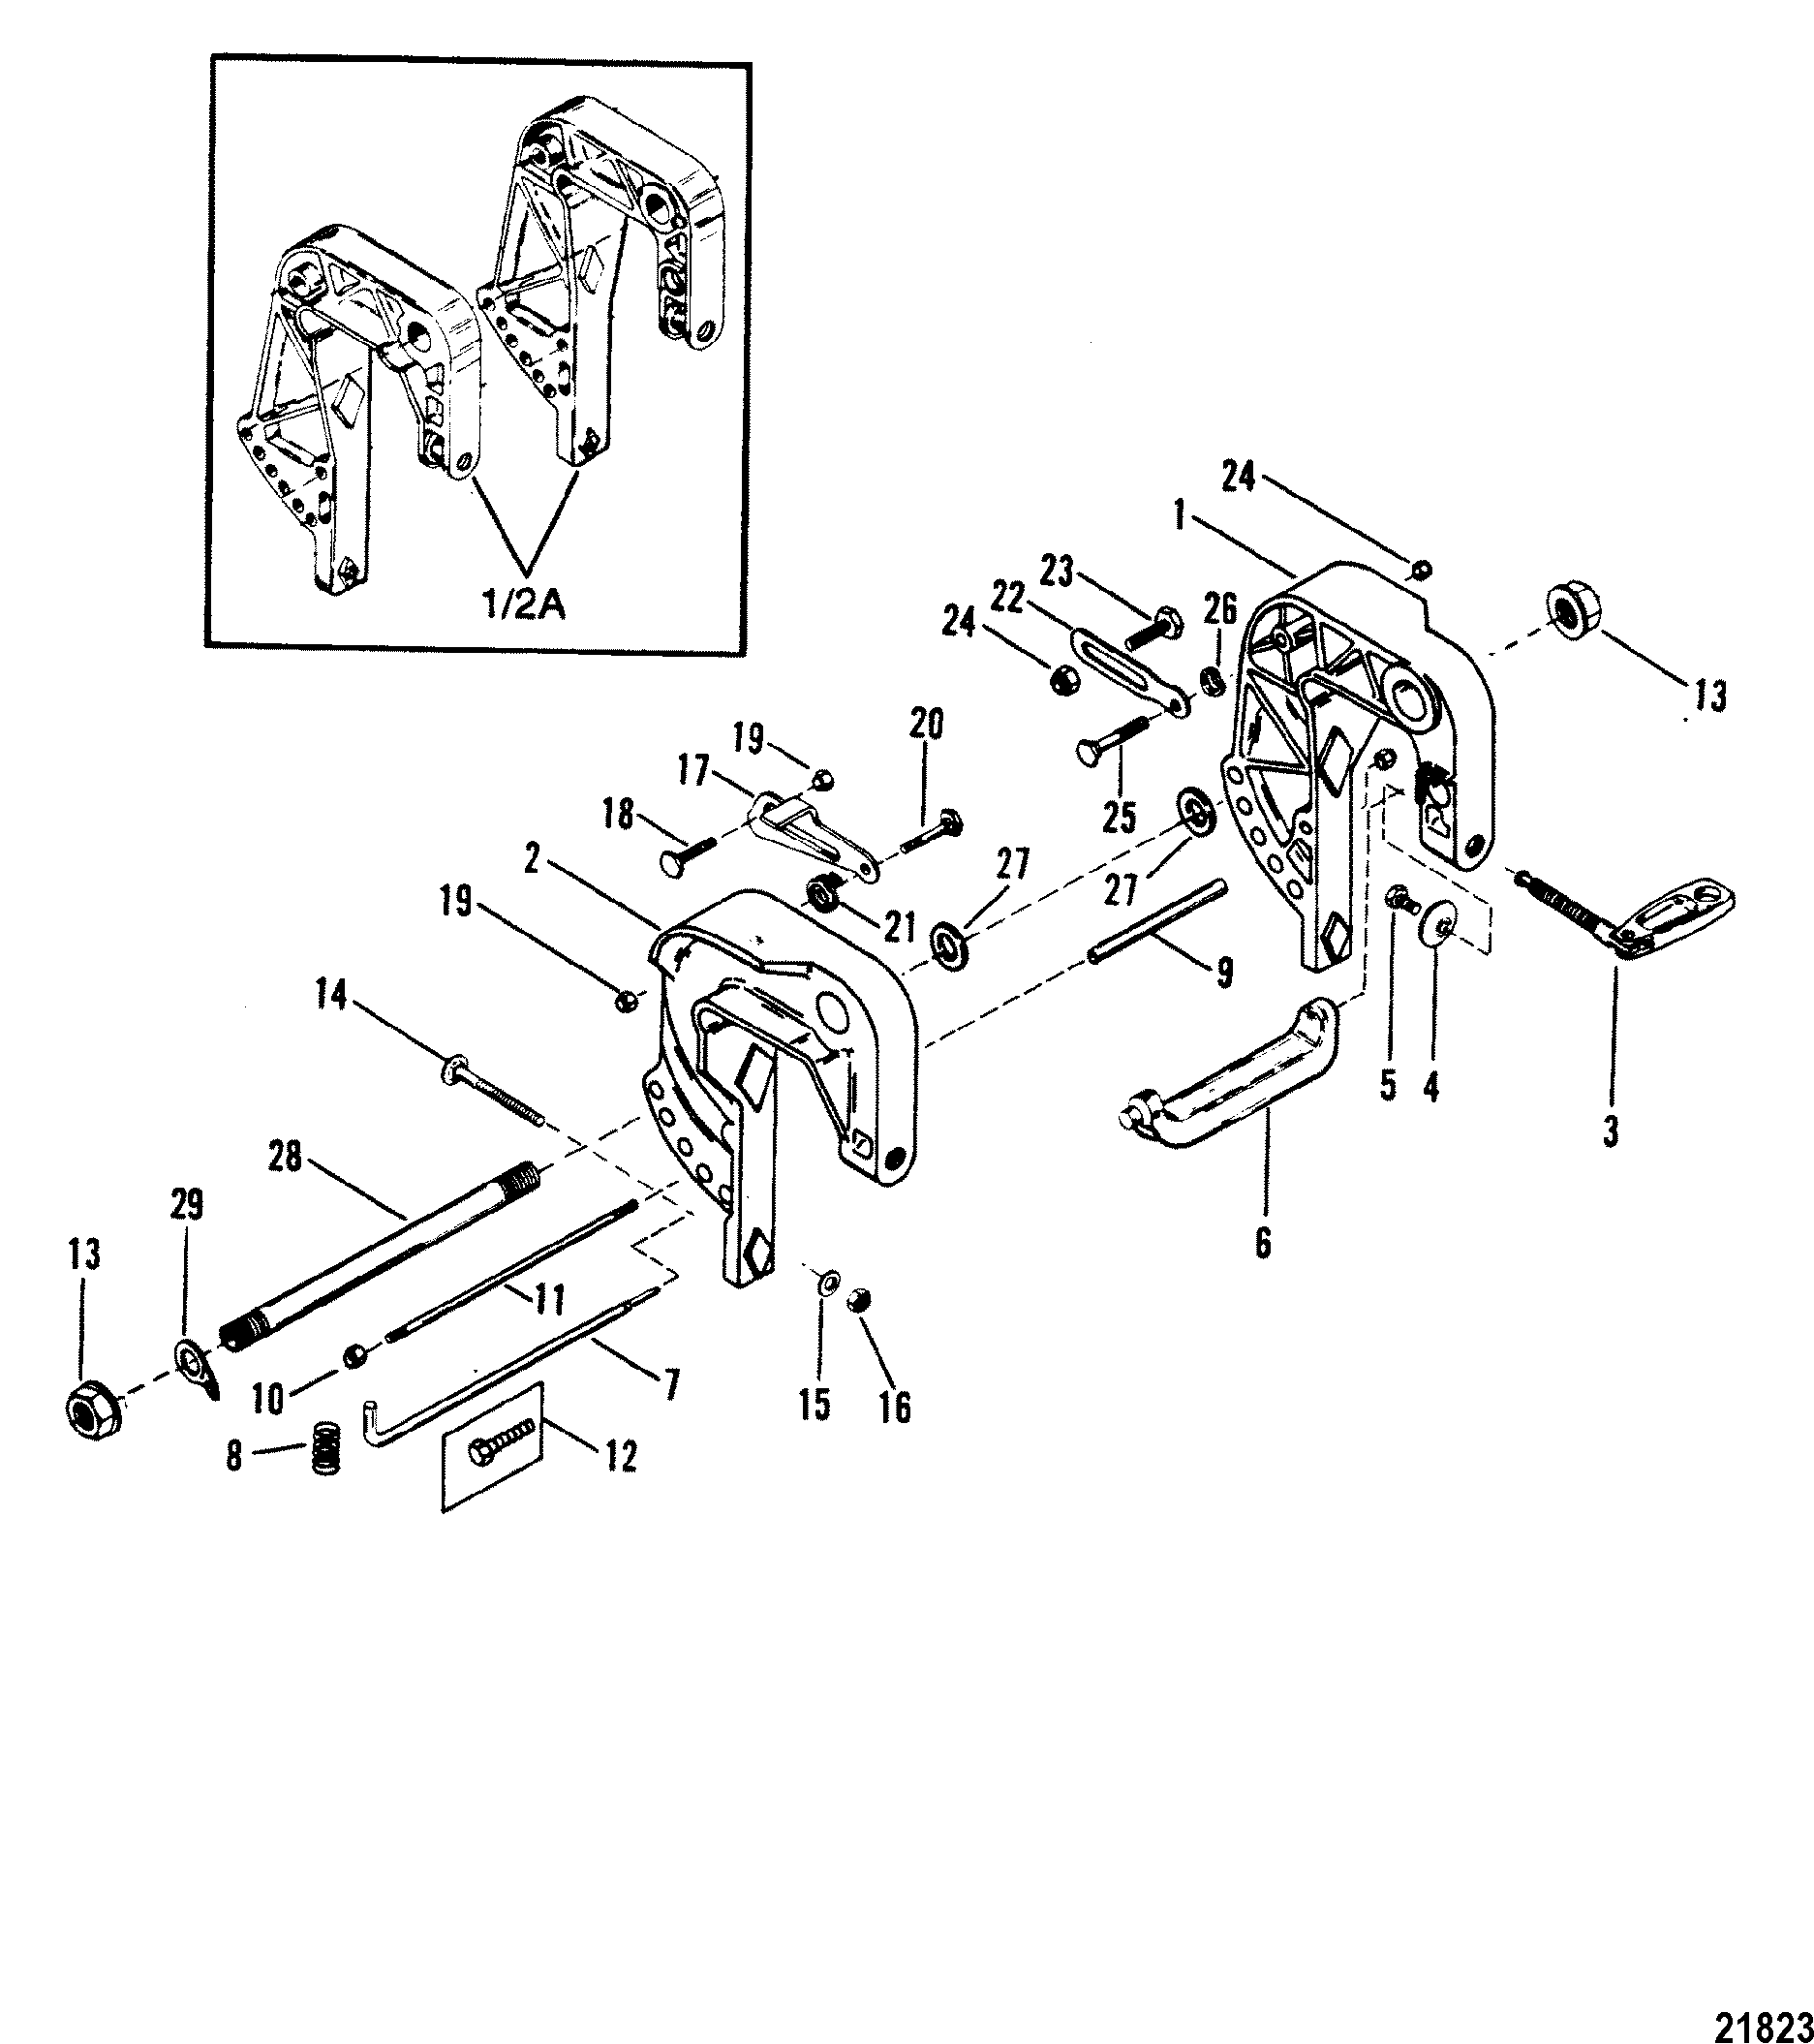 Clamp Bracket Assembly FOR MARINER / MERCURY 20 H.P /25 H.P. SEA PRO  /MARATHON 25 SUPER 15